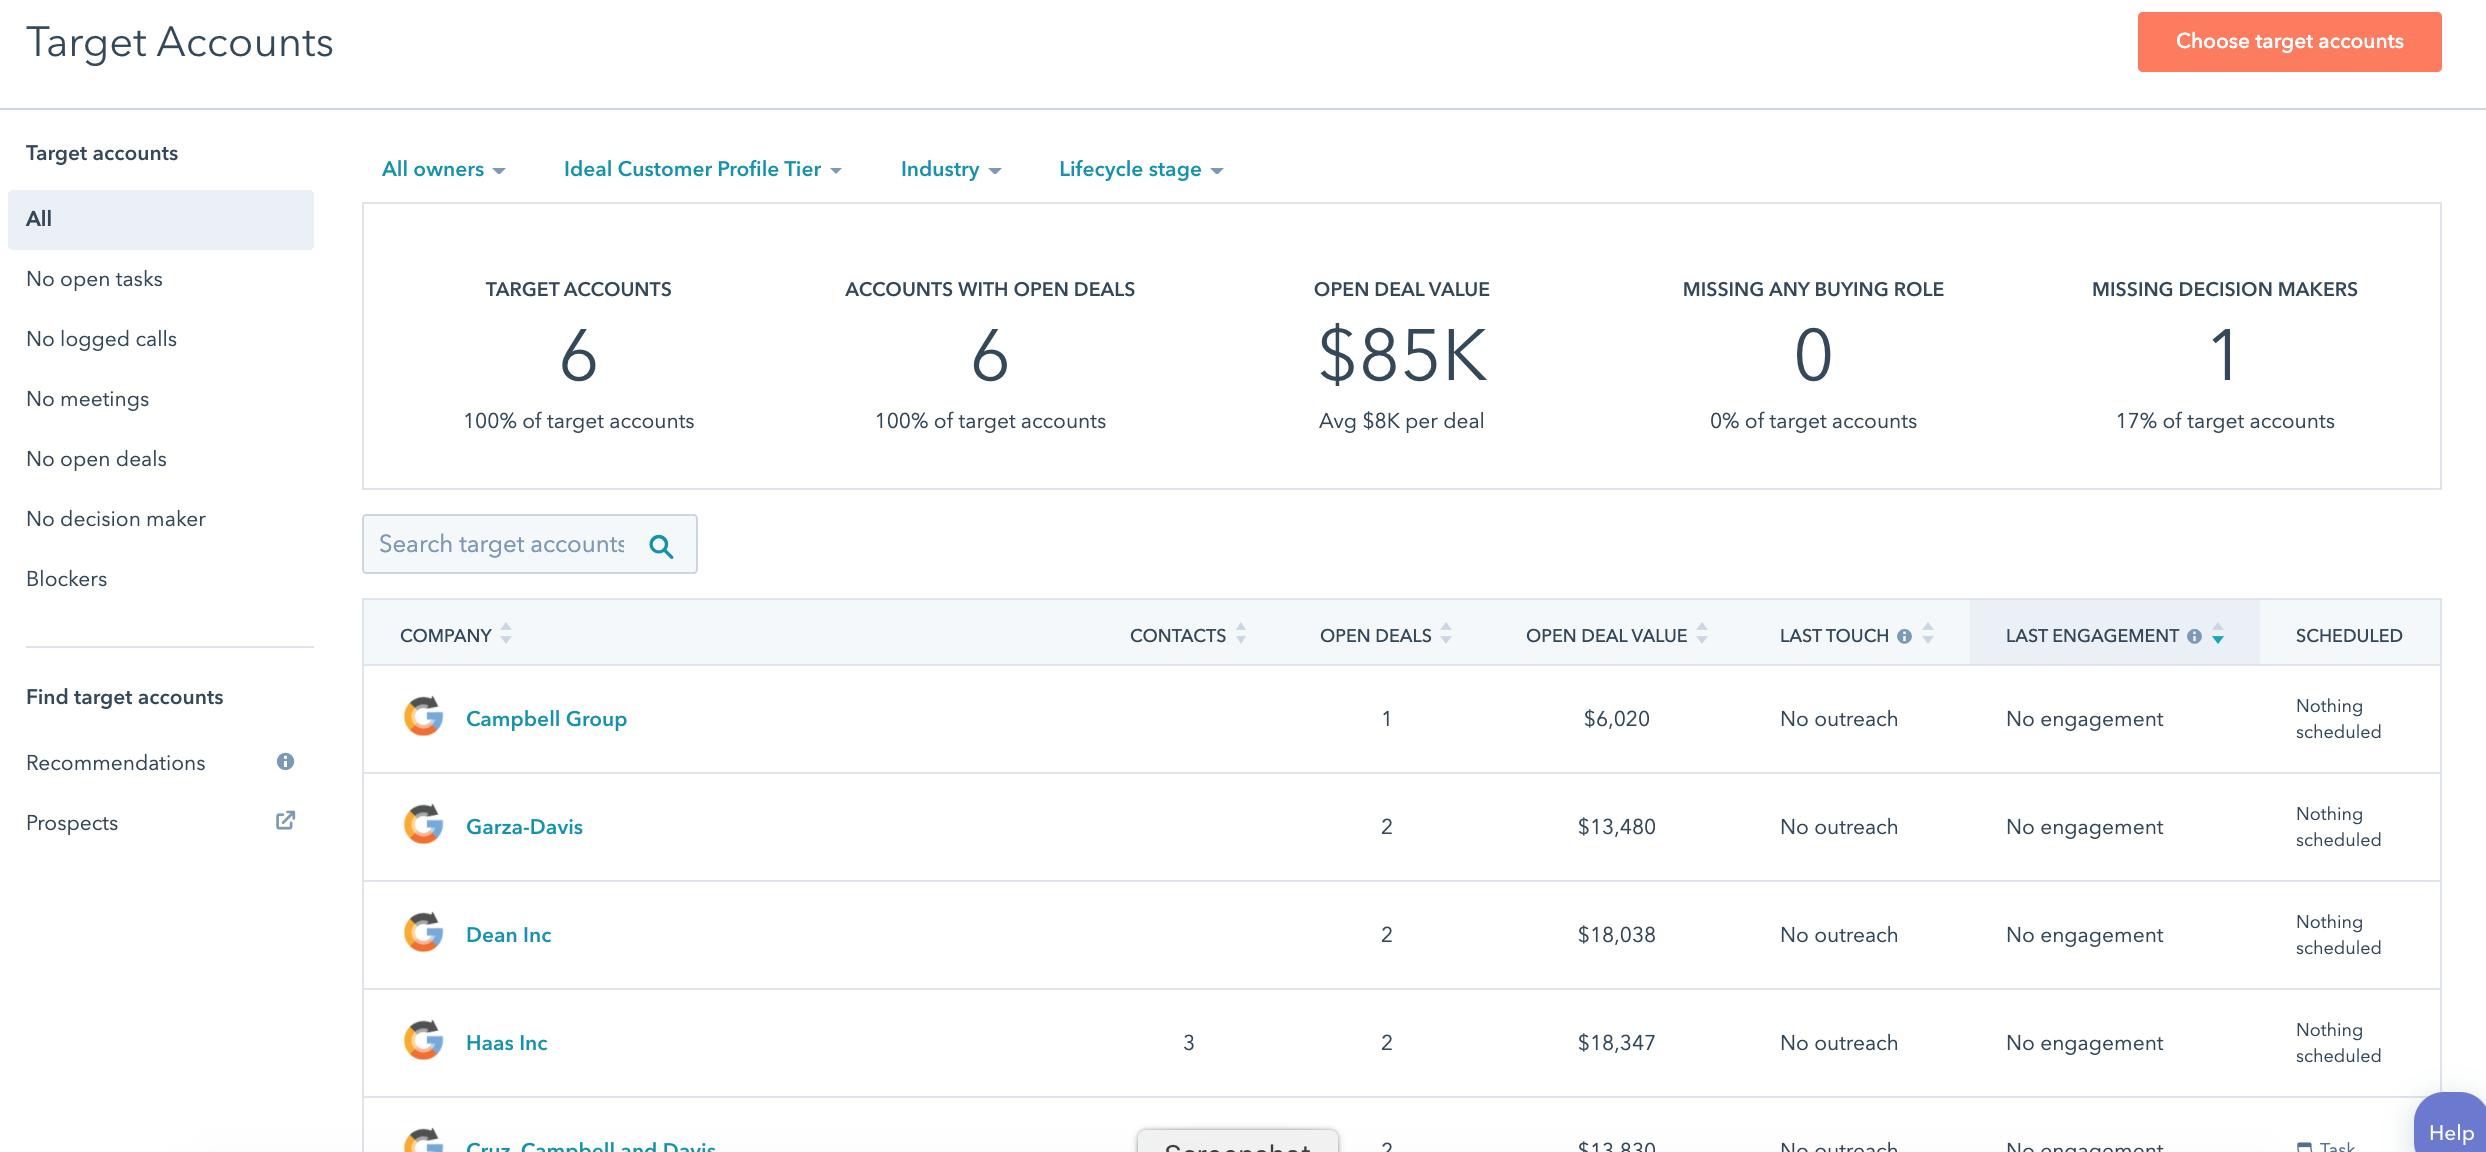 Using HubSpot account-based marketing tools